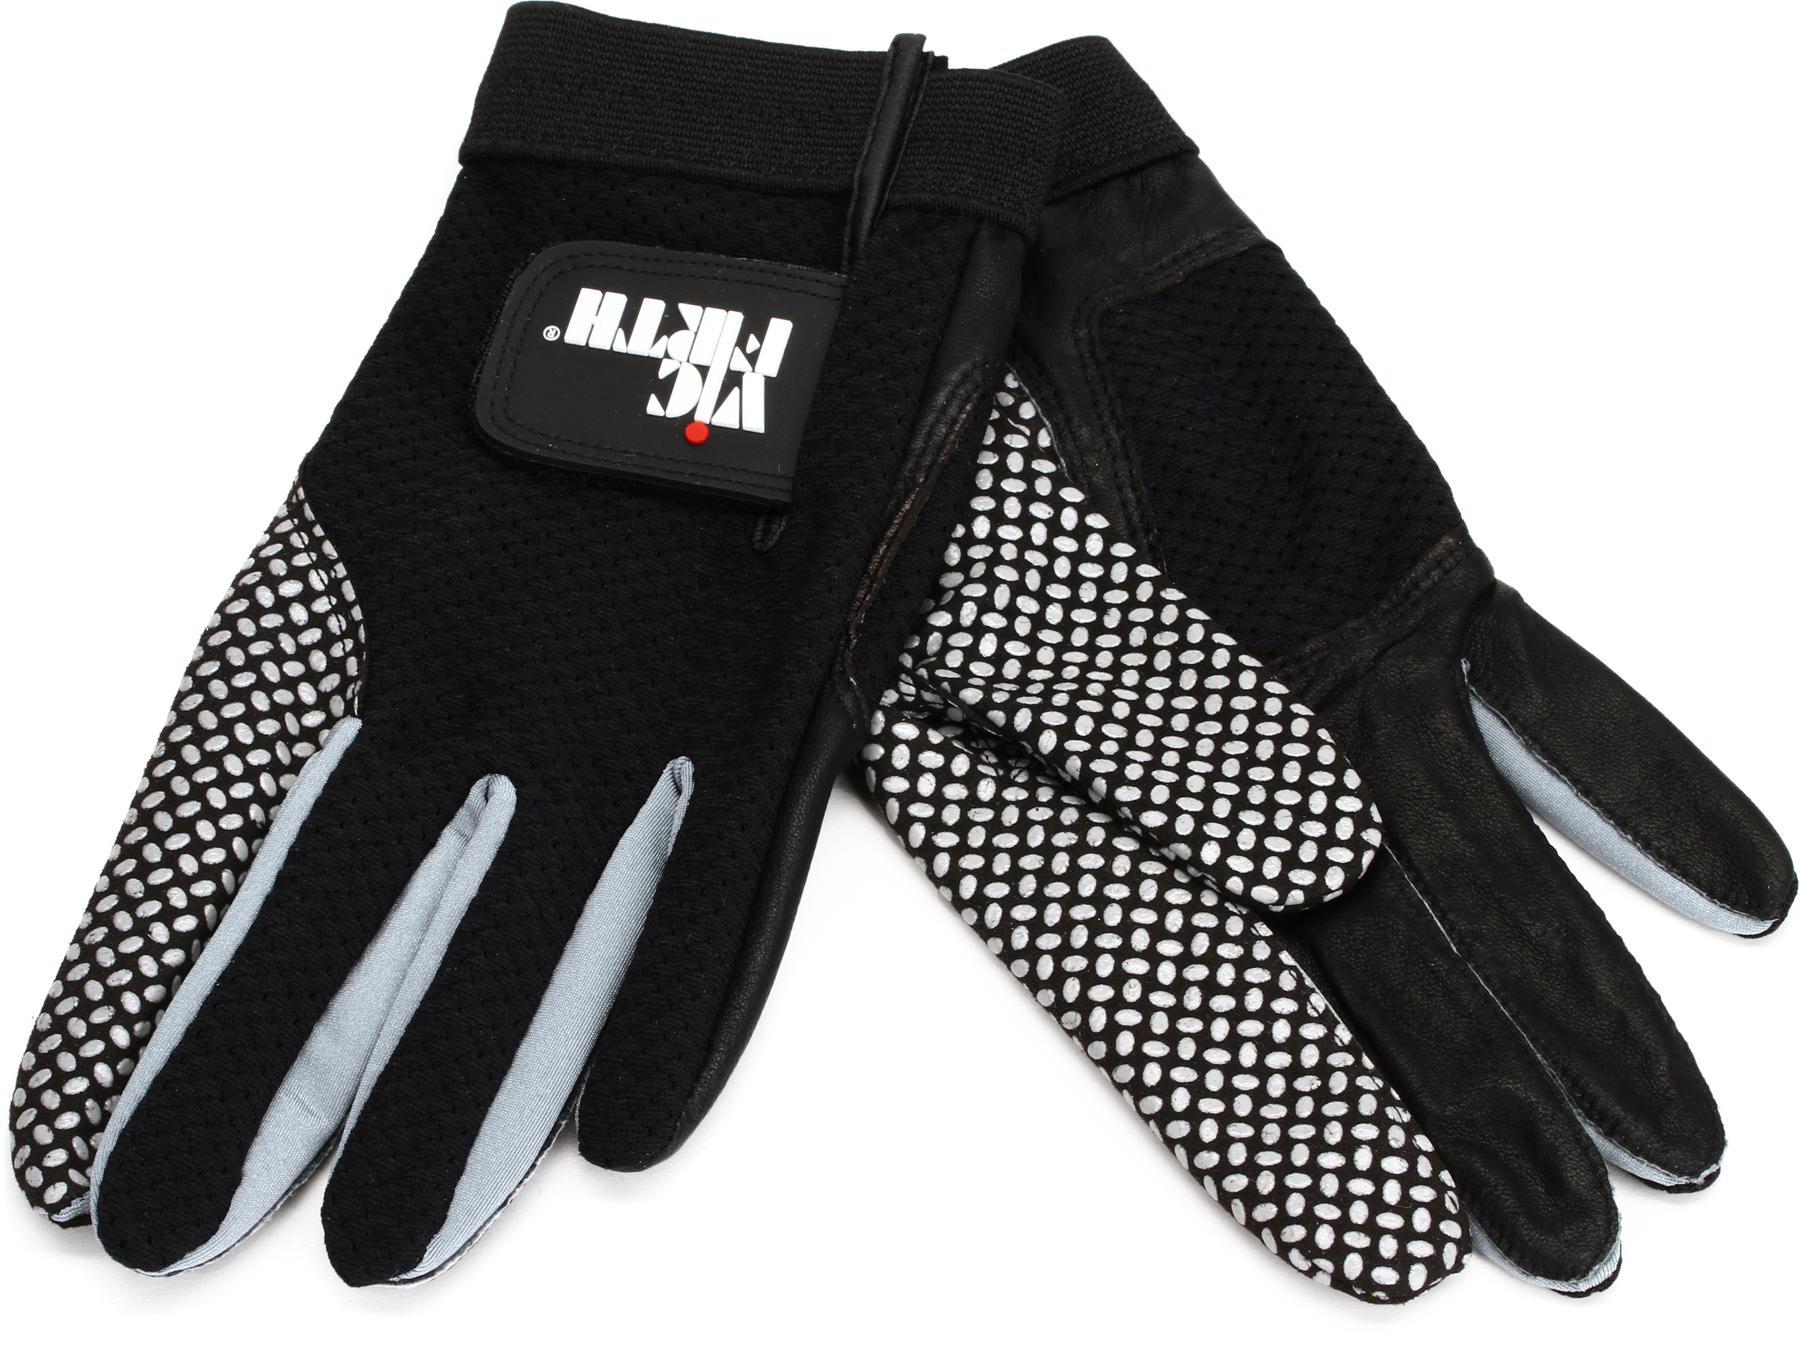 5. Vic Firth Drumming Glove